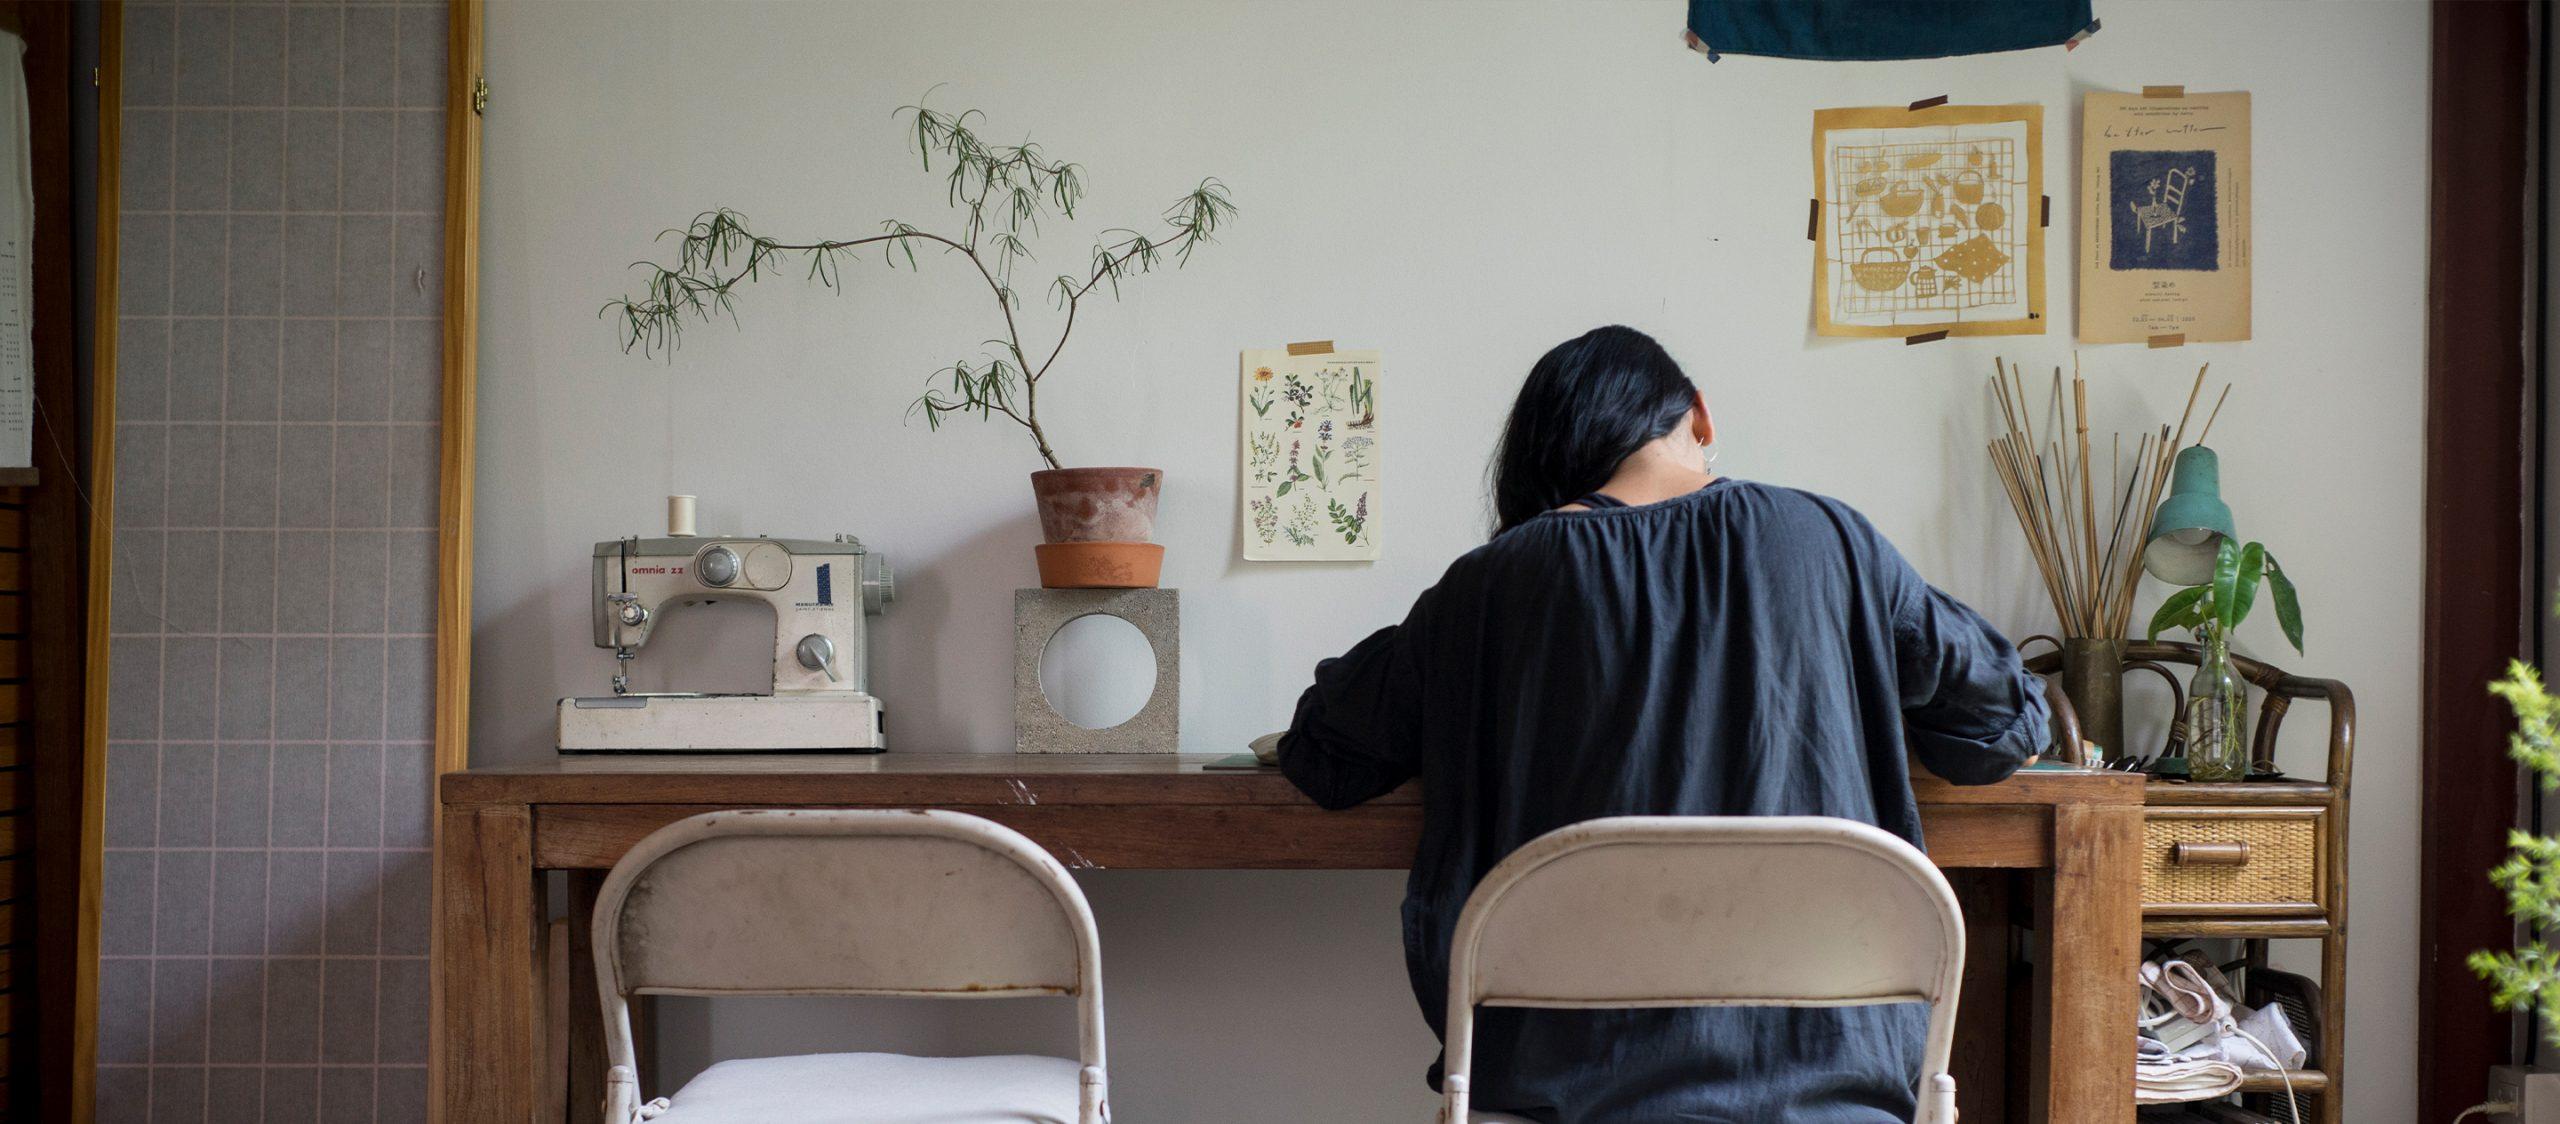 jibberish แบรนด์ผ้าย้อมครามเชียงใหม่ที่ยืมเคล็ดลับจากคนญี่ปุ่น อินเดีย และผู้คนระหว่างทาง